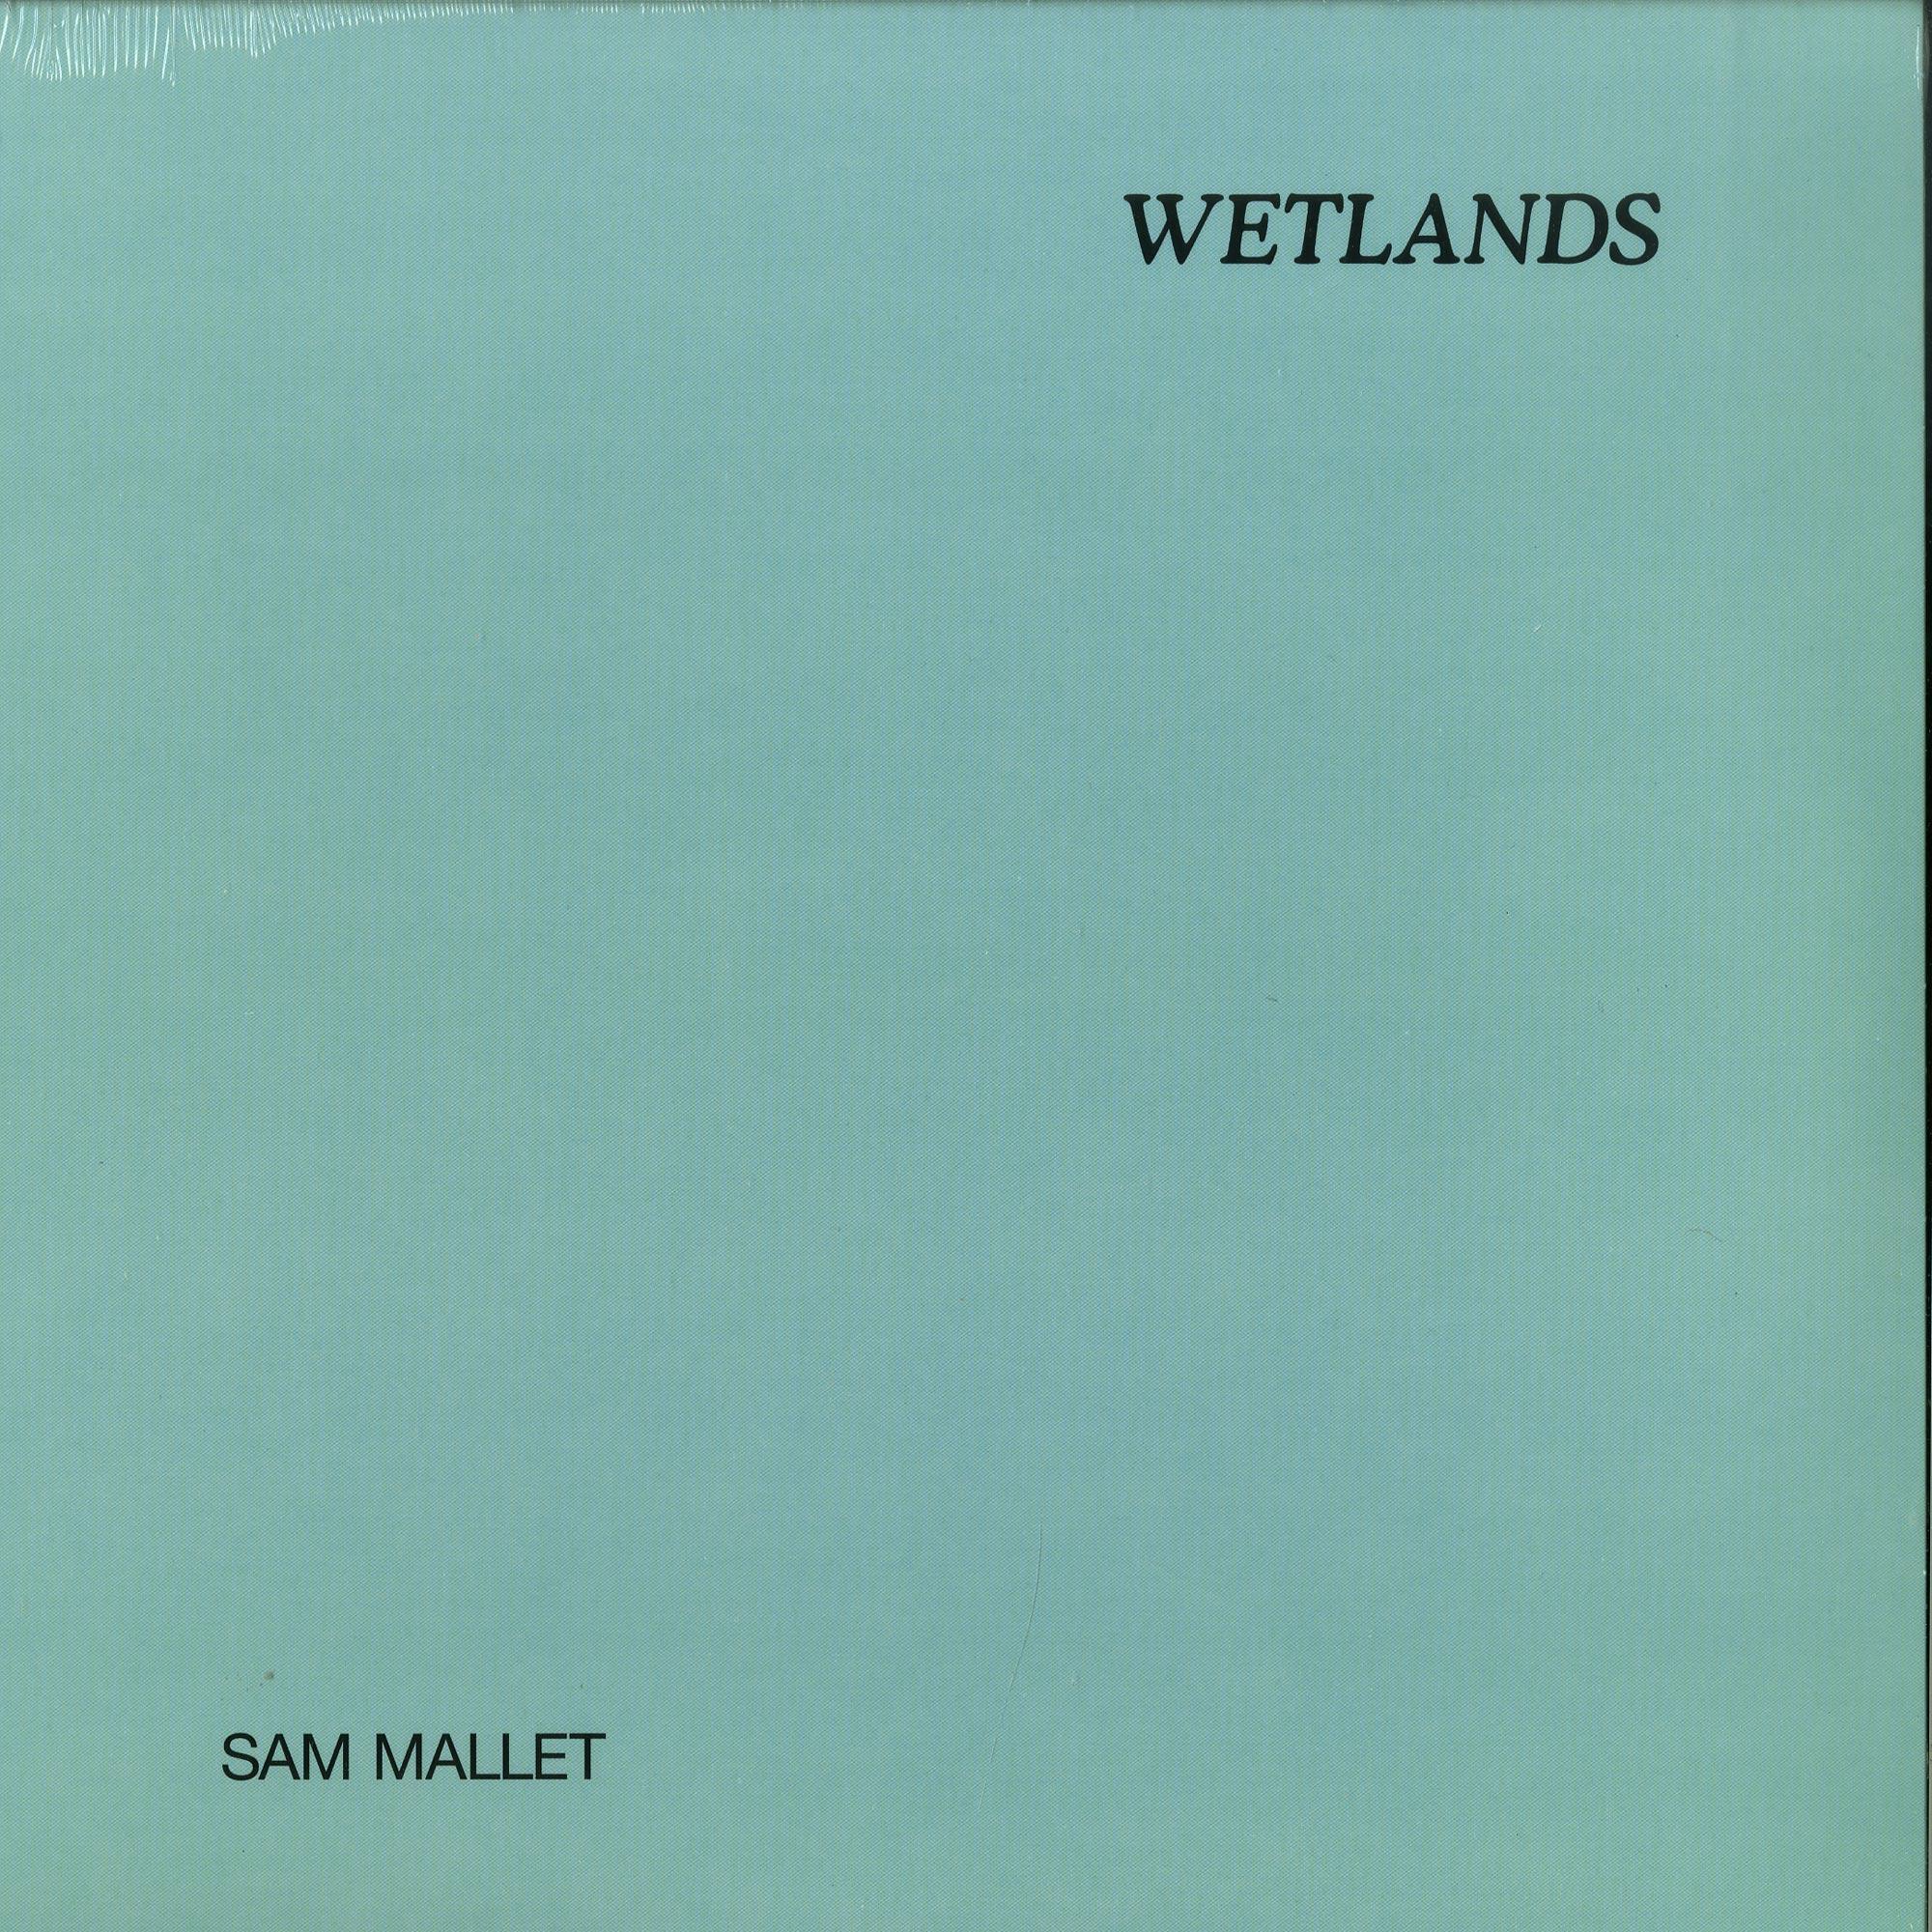 Sam Mallet - WETLANDS